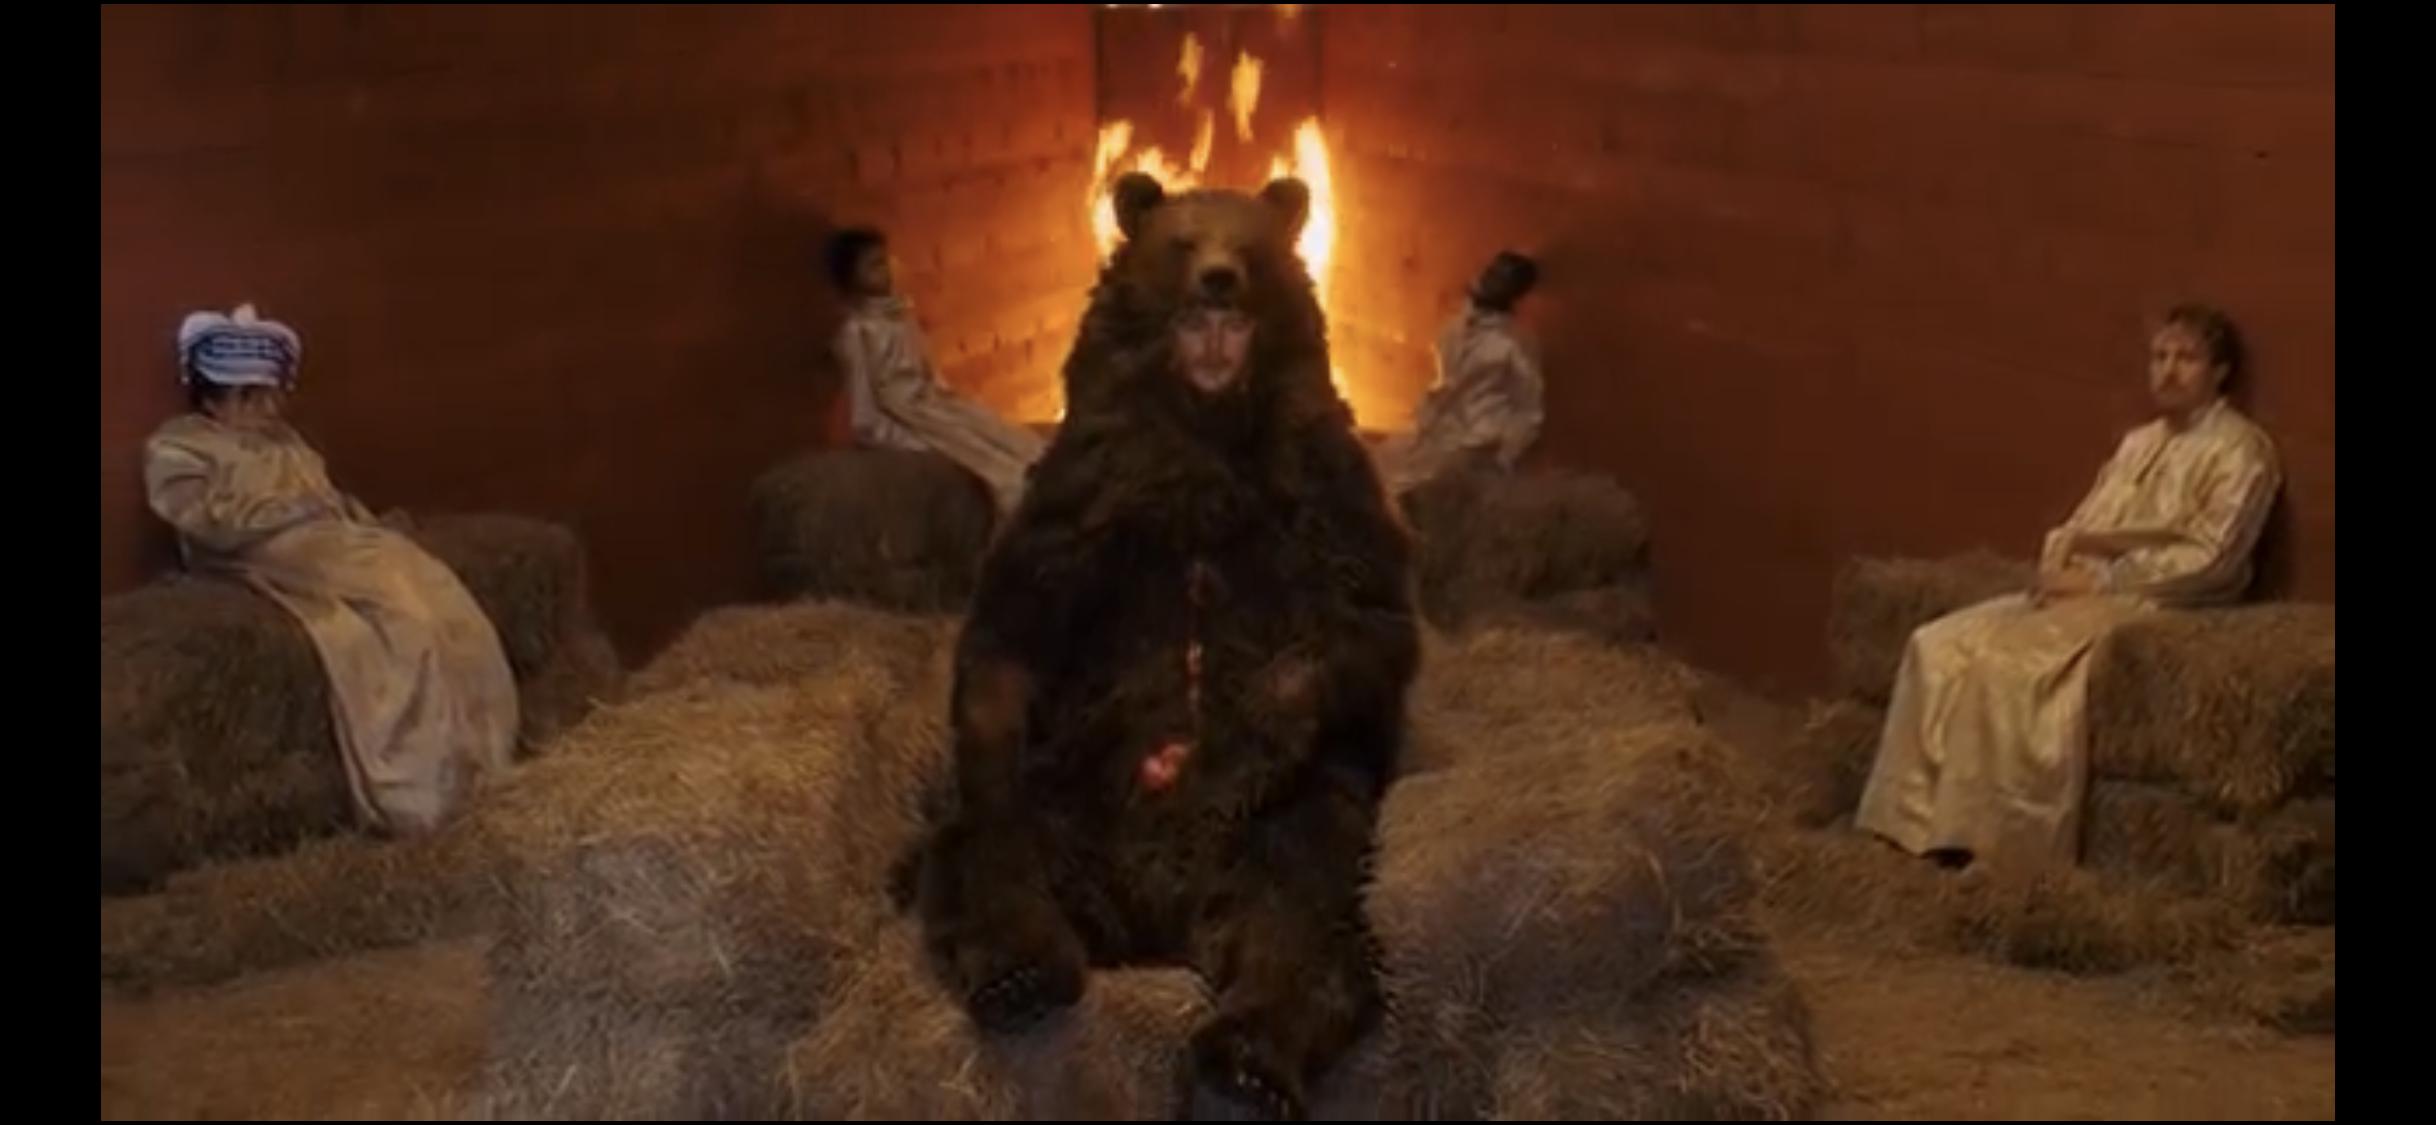 Midsommar Bear | Movie scenes, Scary movies, Movie art